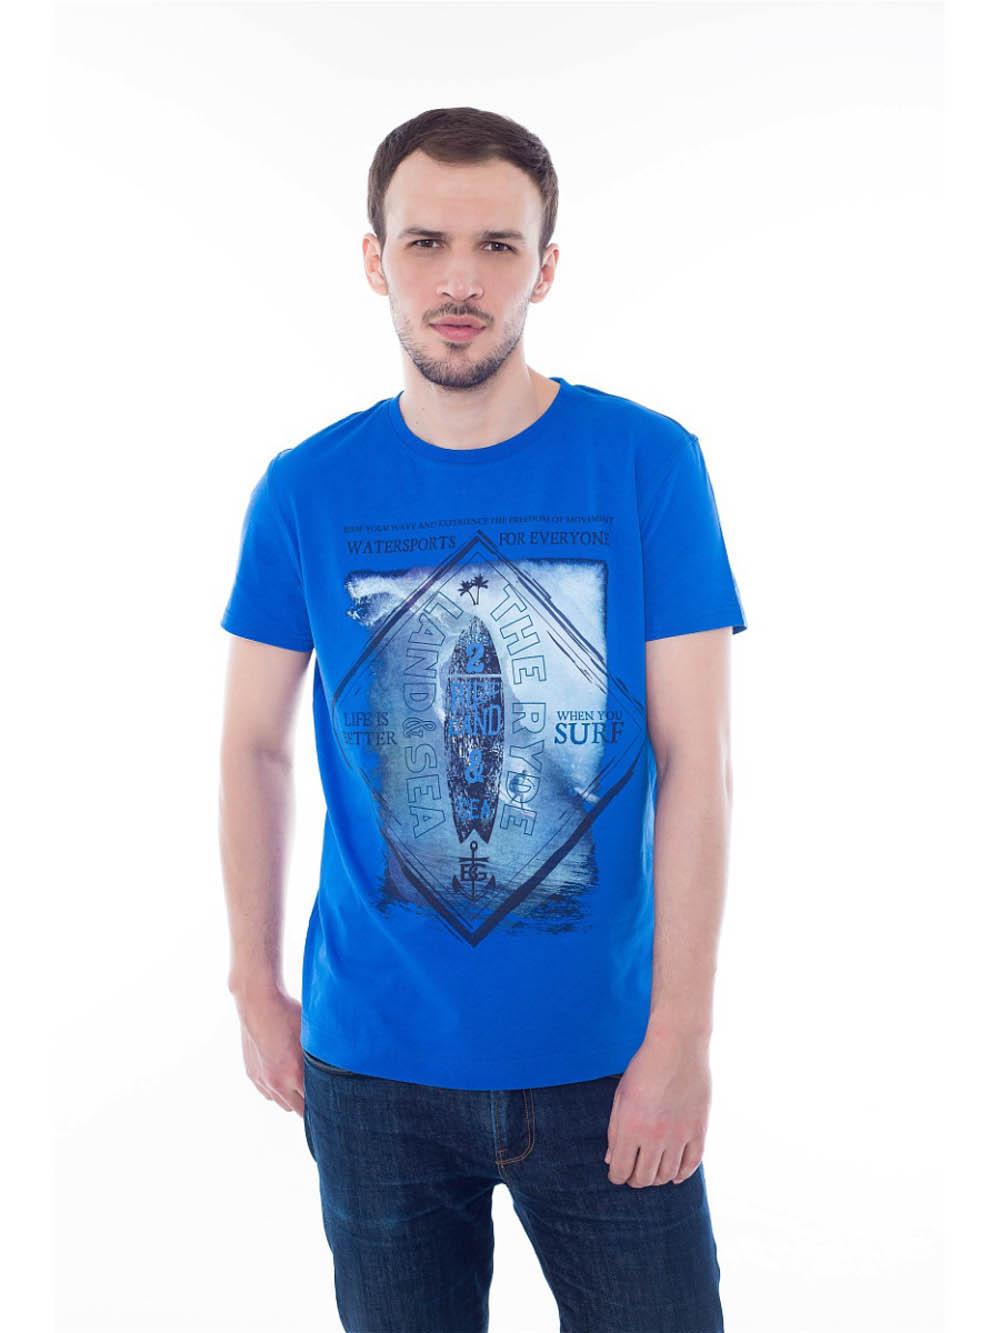 Футболки BeGood Футболка Water Sports Цвет: Синий (L-xL) футболка xl это какой размер